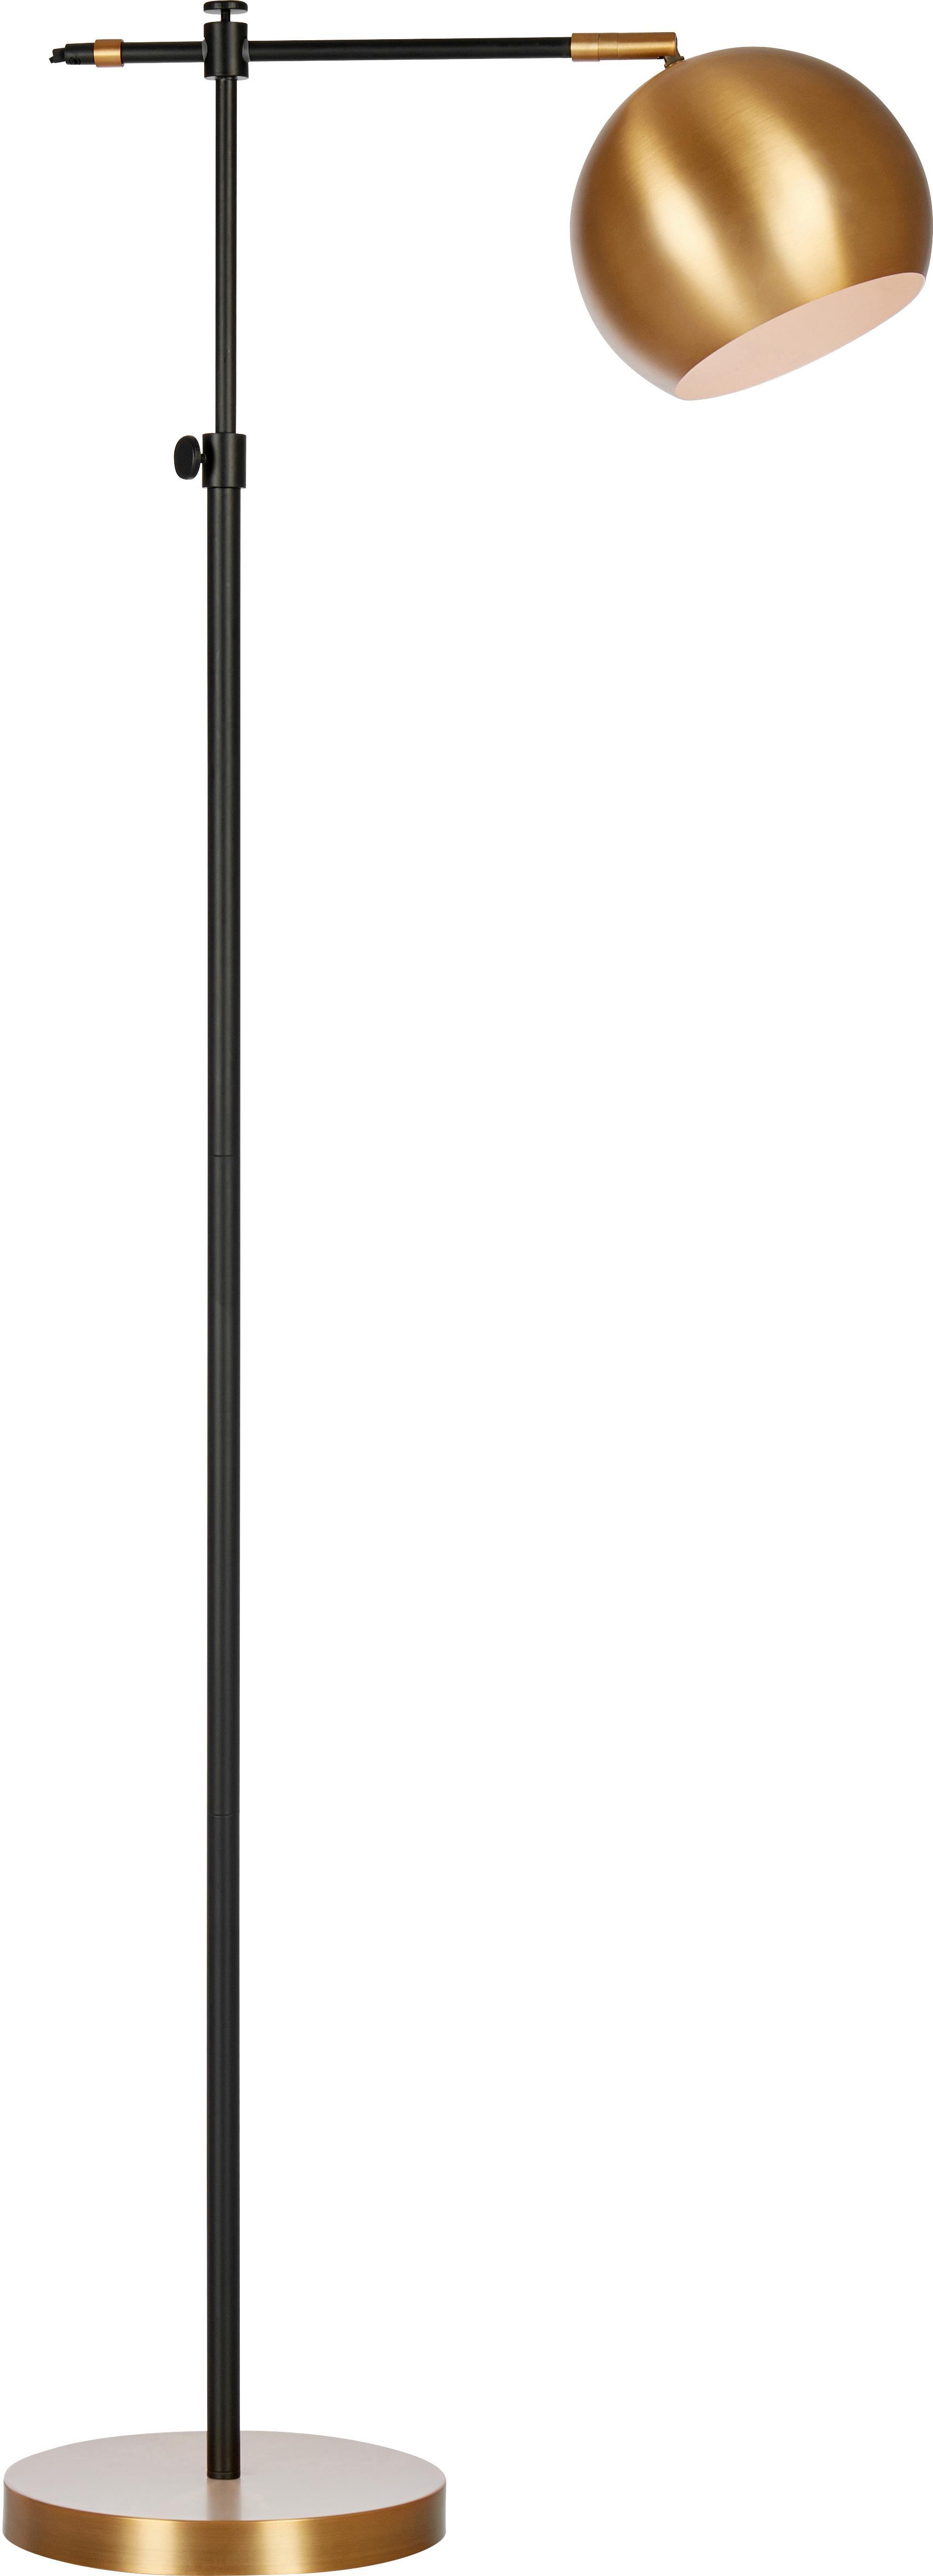 Leselampe Chester, Messing, lackiert, Braun, Schwarz, 25 x 135 cm